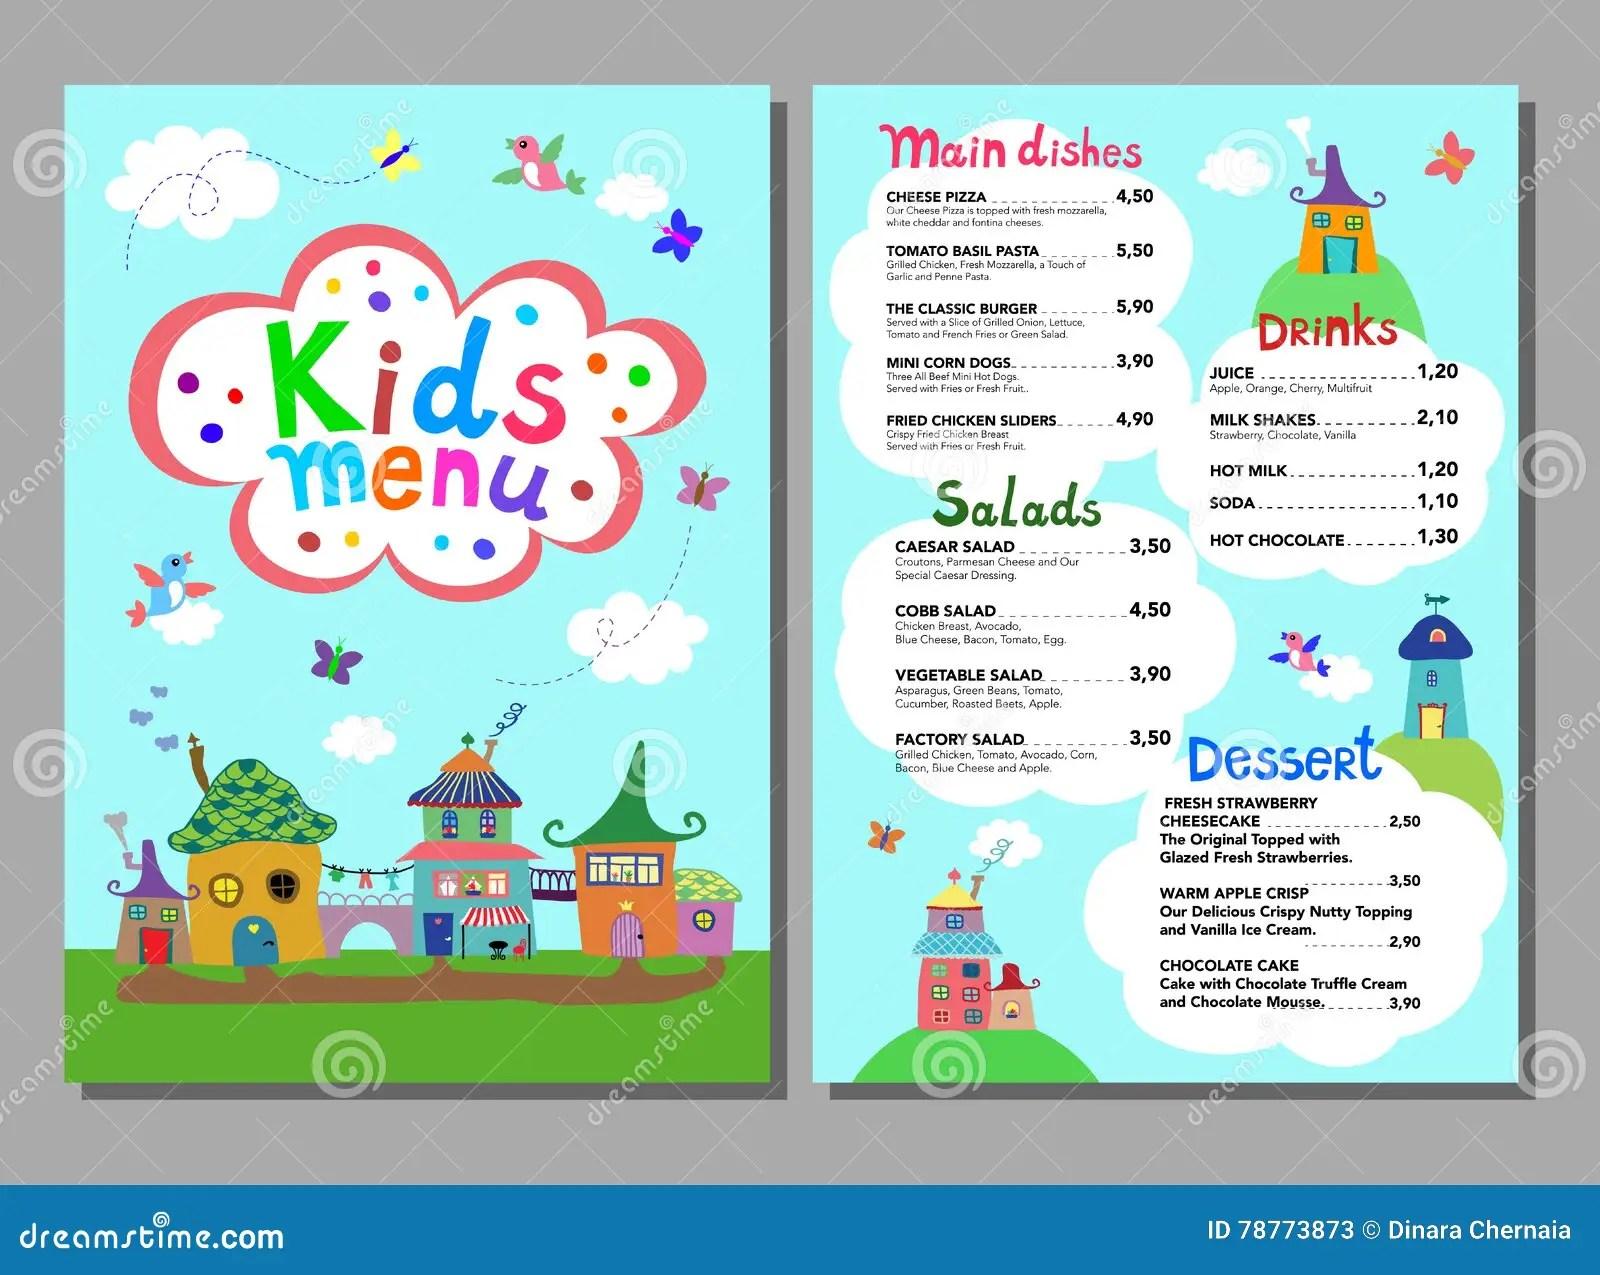 Cute Colorful Meal Kids Menu Template Stock Vector